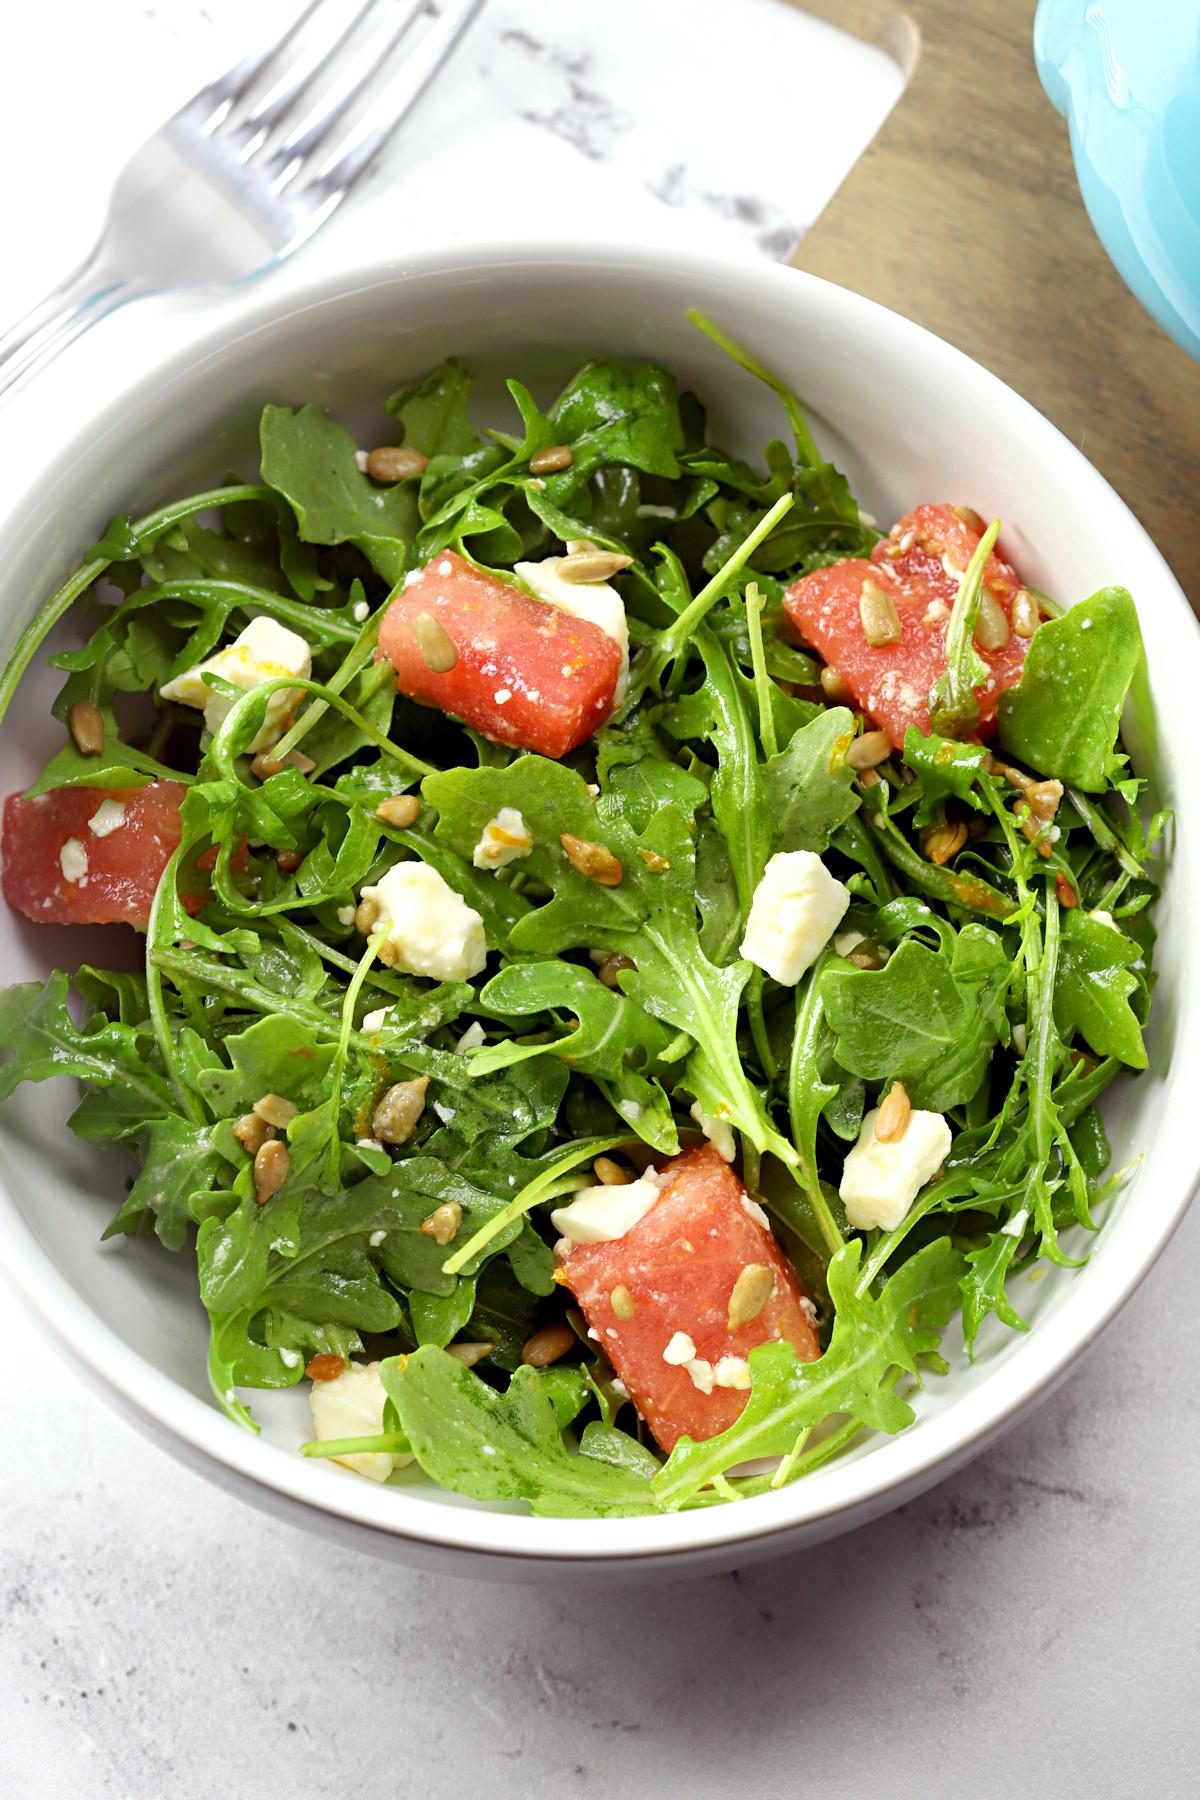 Bowl of arugula salad with watermelon.